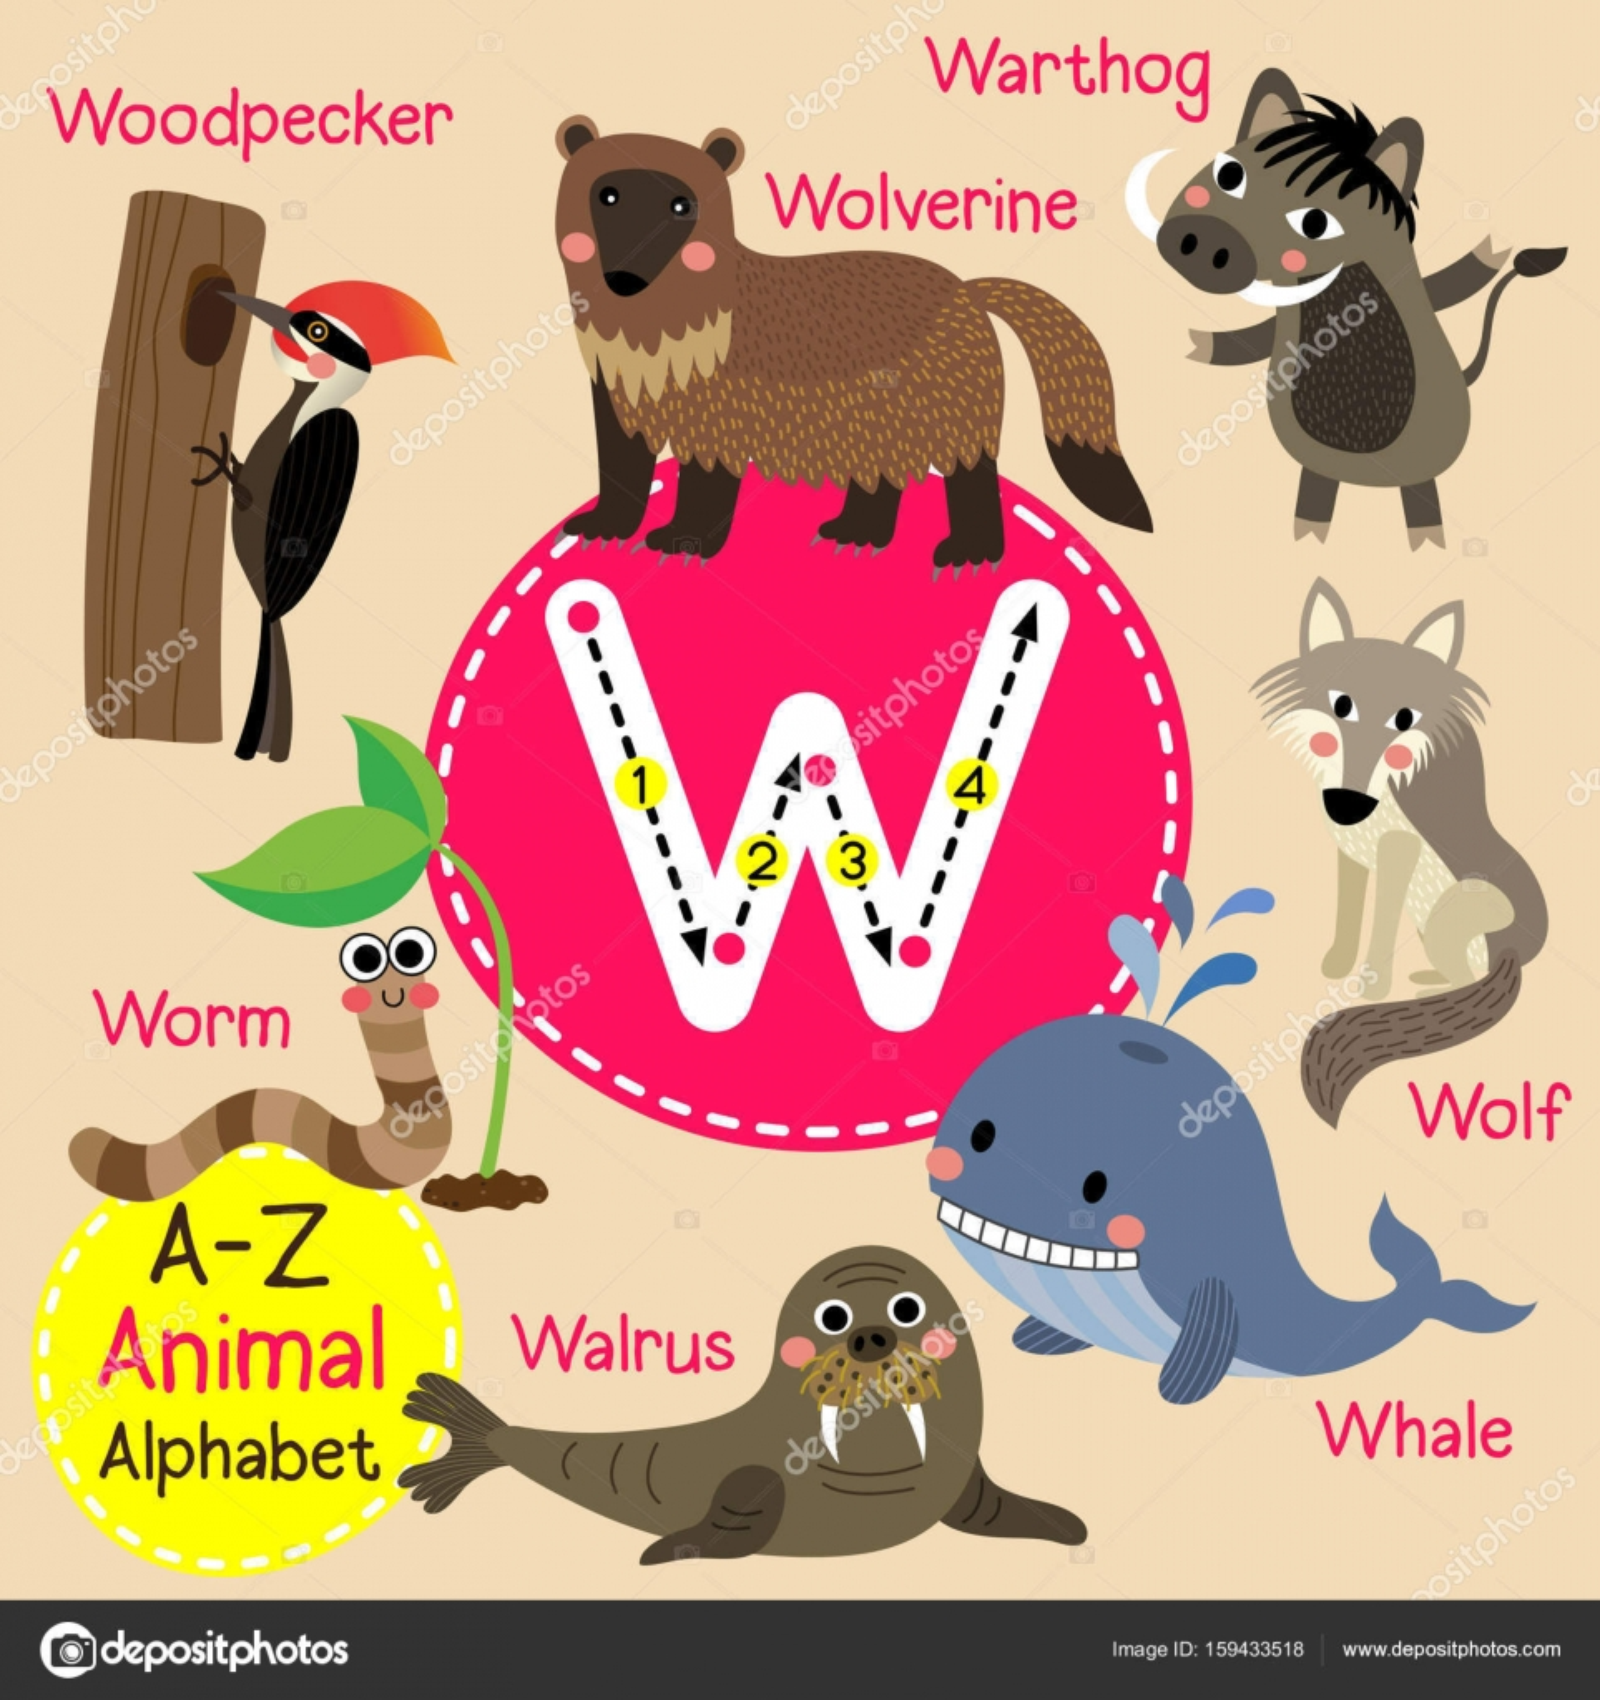 Animals | LearnEnglish Kids - British Council